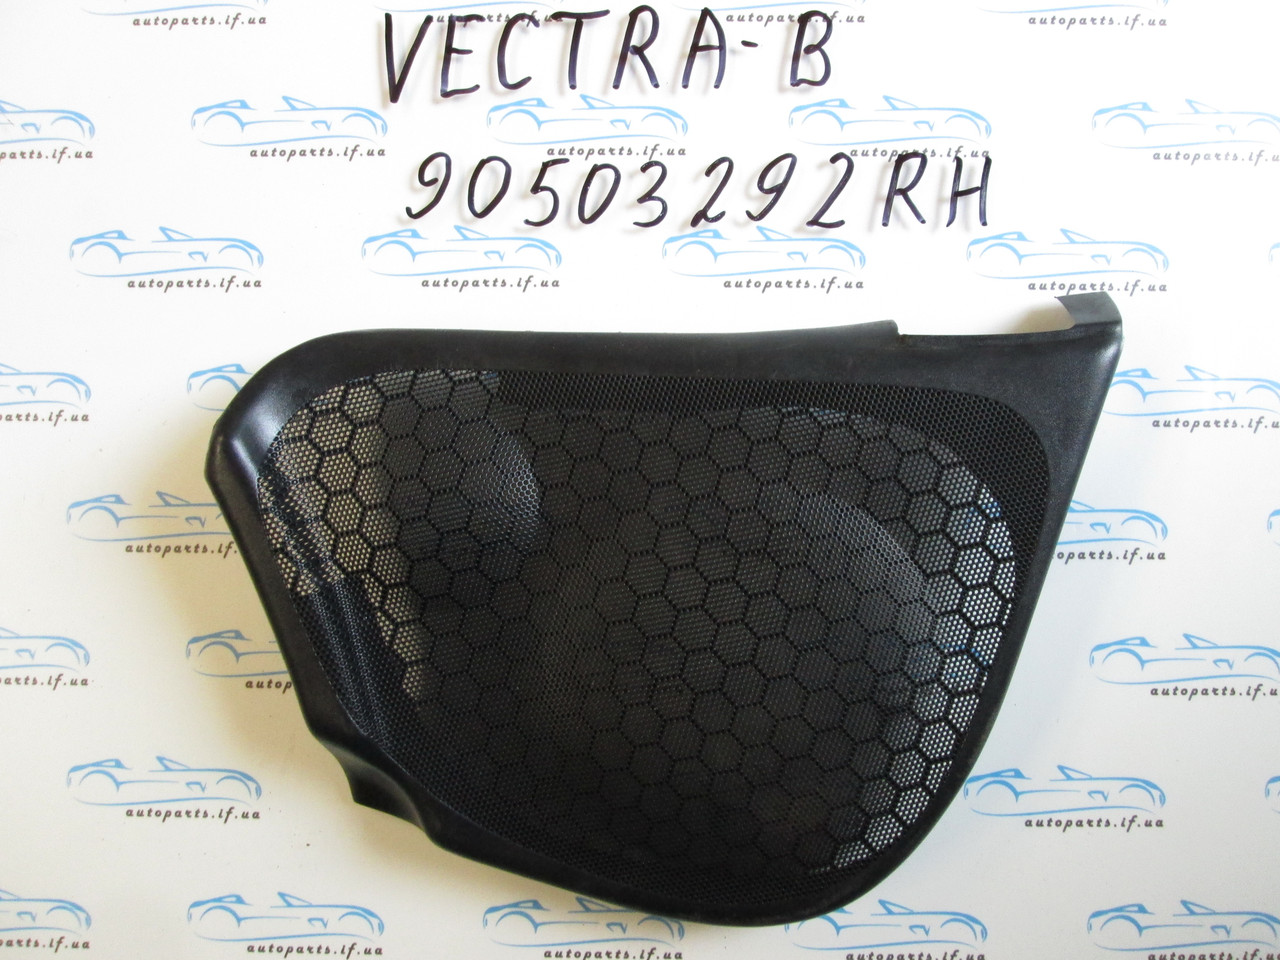 Накладка динамика Вектра Б, opel Vectra B 90503292 правая перед